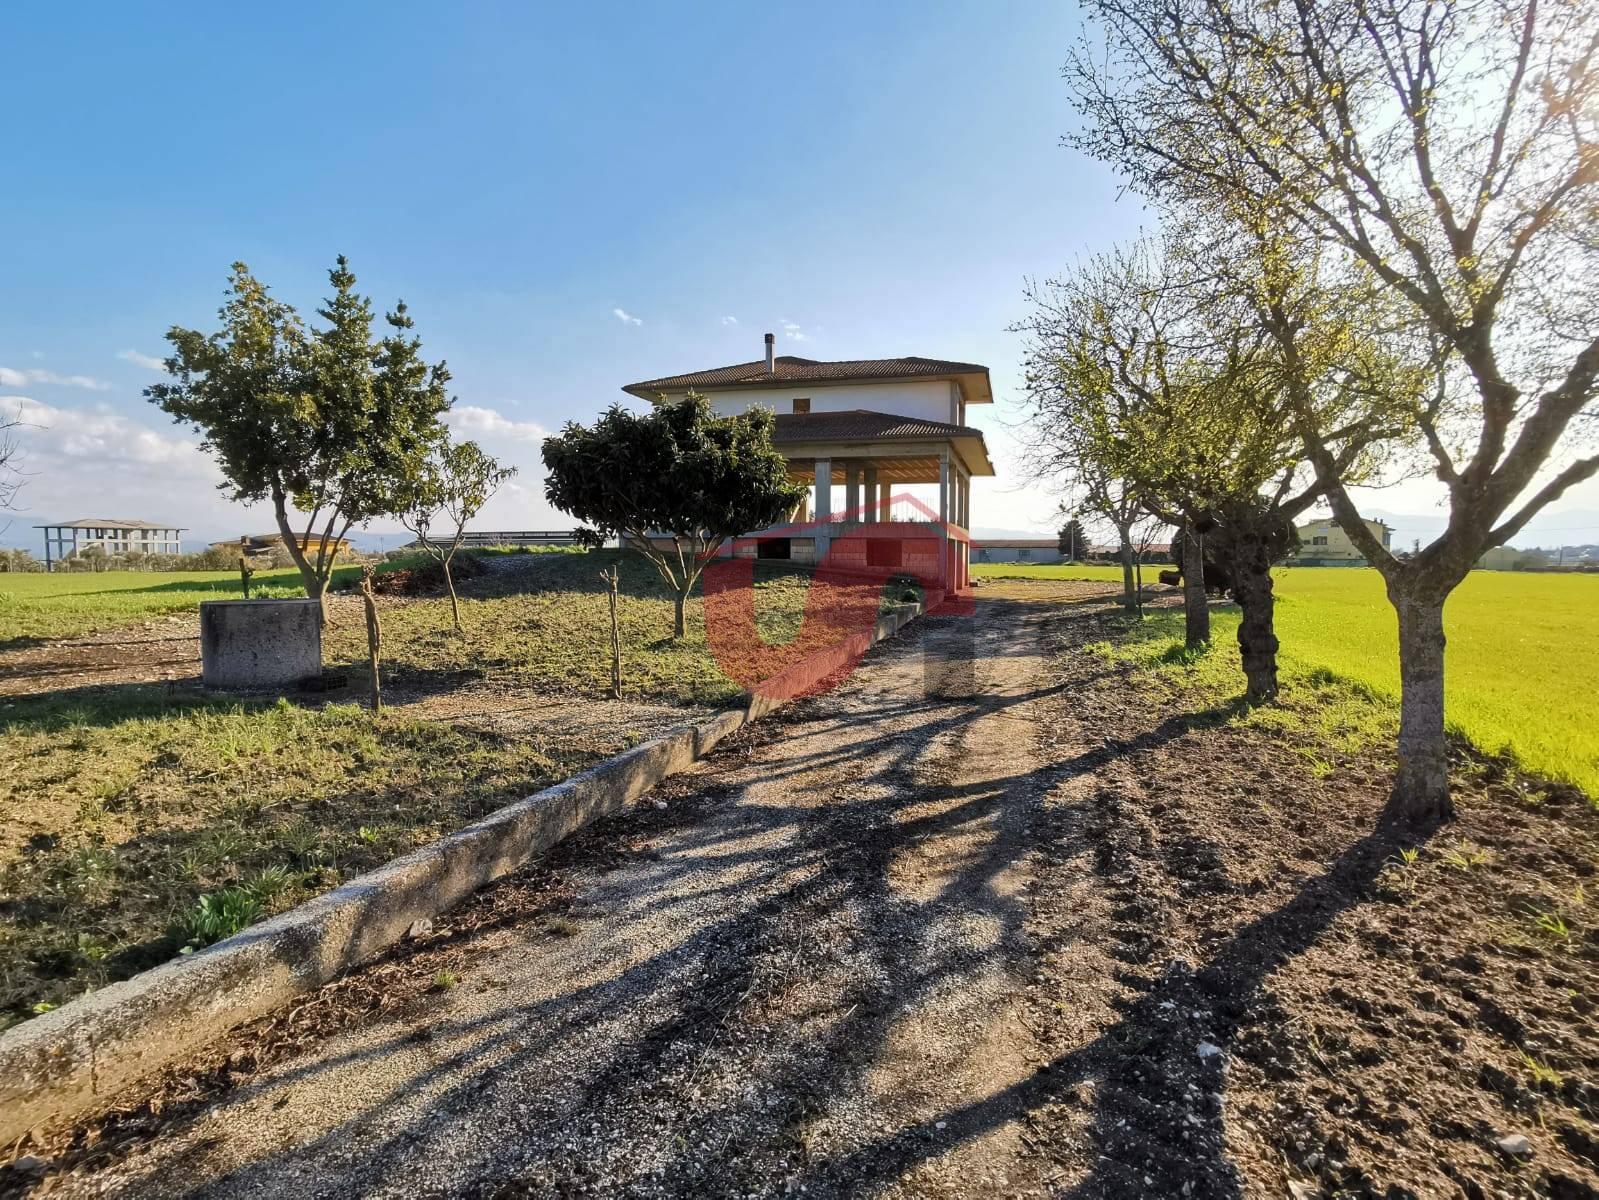 Foto - Villa In Vendita Pietrelcina (bn)